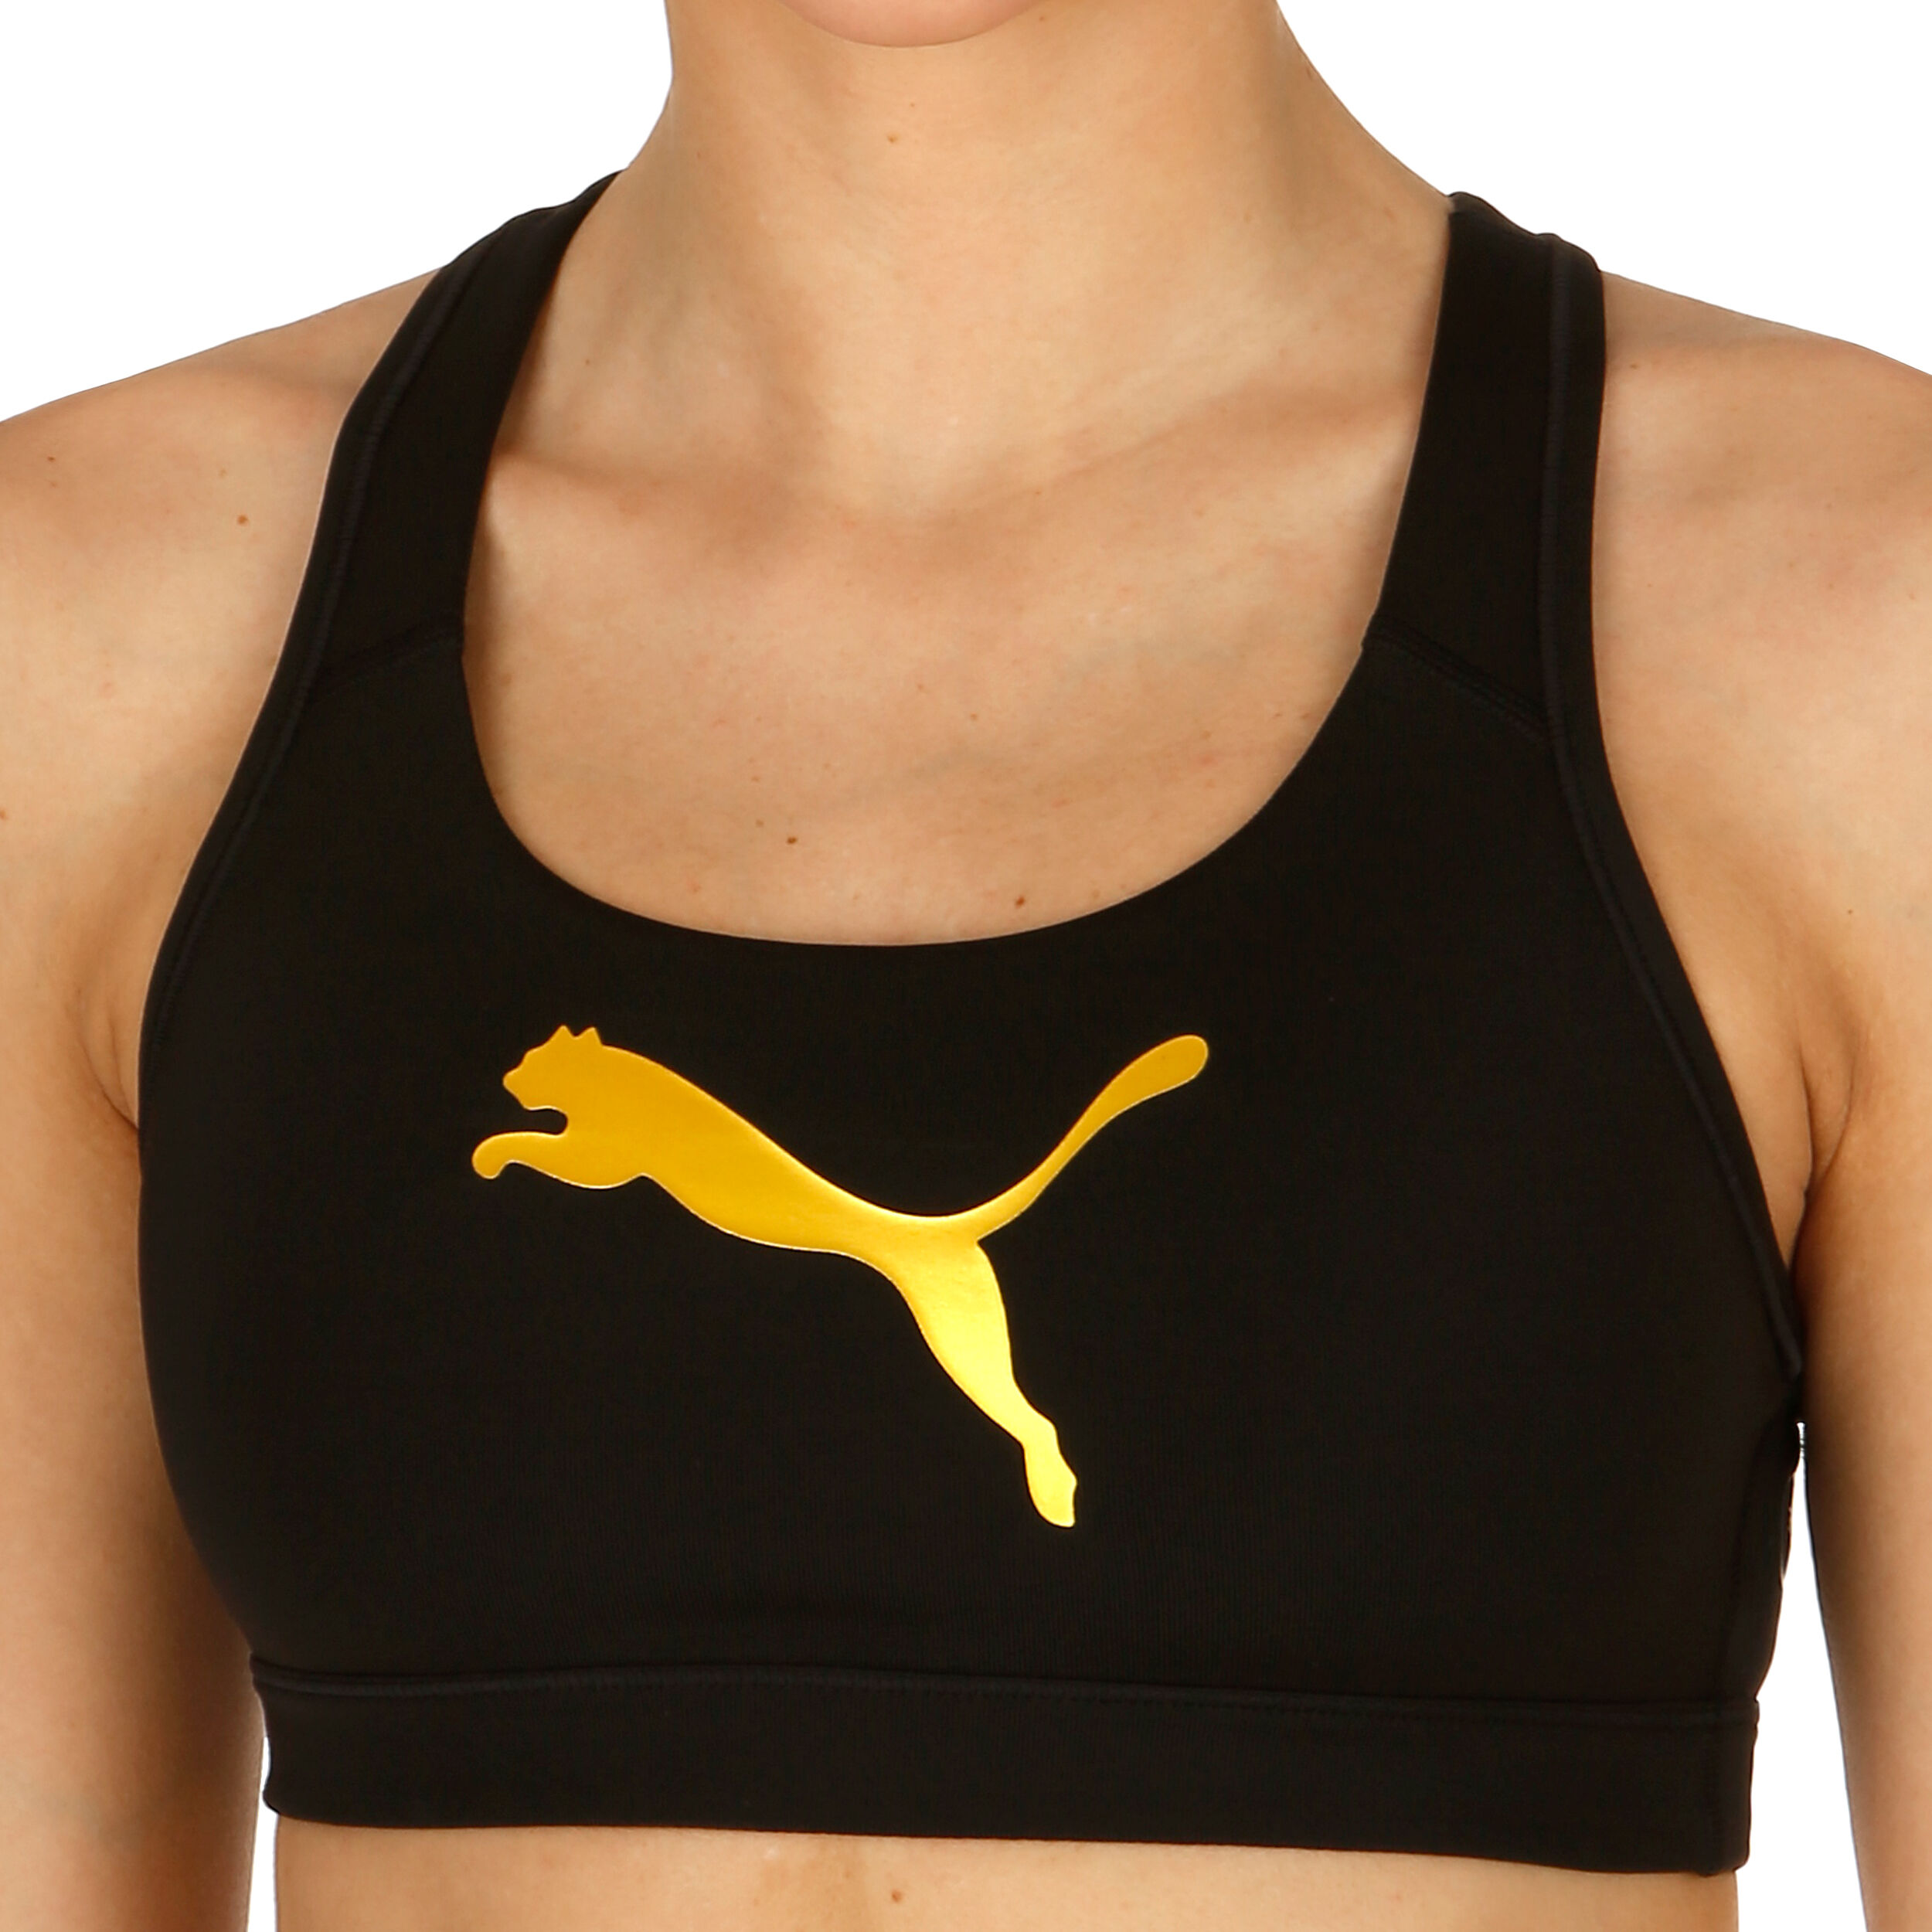 buy Puma Pwrshape Forever Logo Sports Bras Women Black